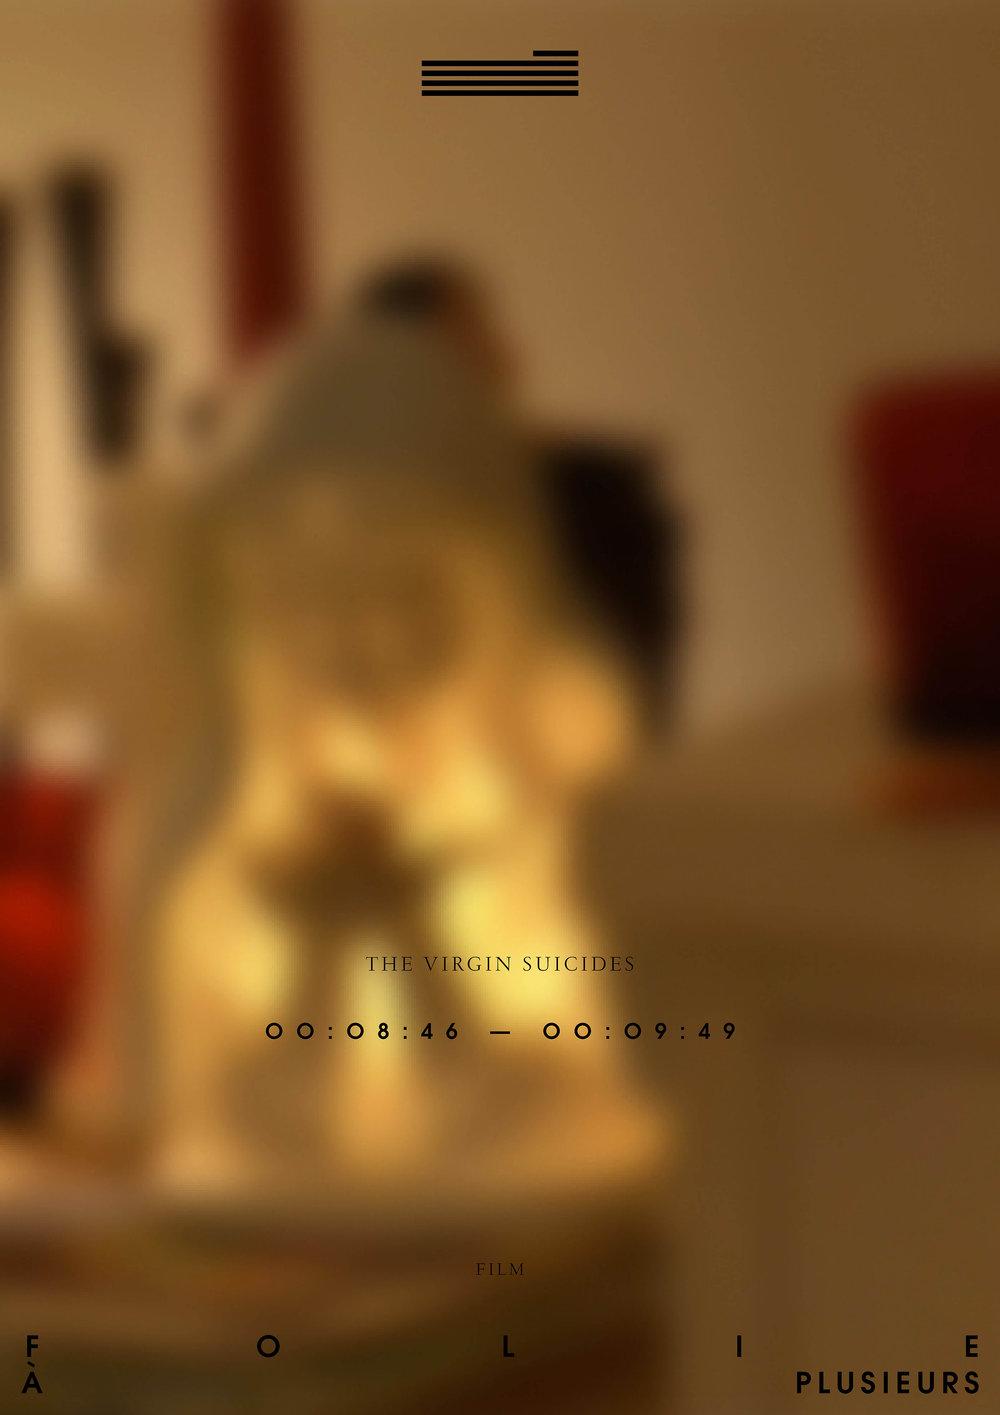 Folie+A+Plusieurs+Perfume+The+Virgins+Sofia+Coppola+Virgin+Suicides.jpg